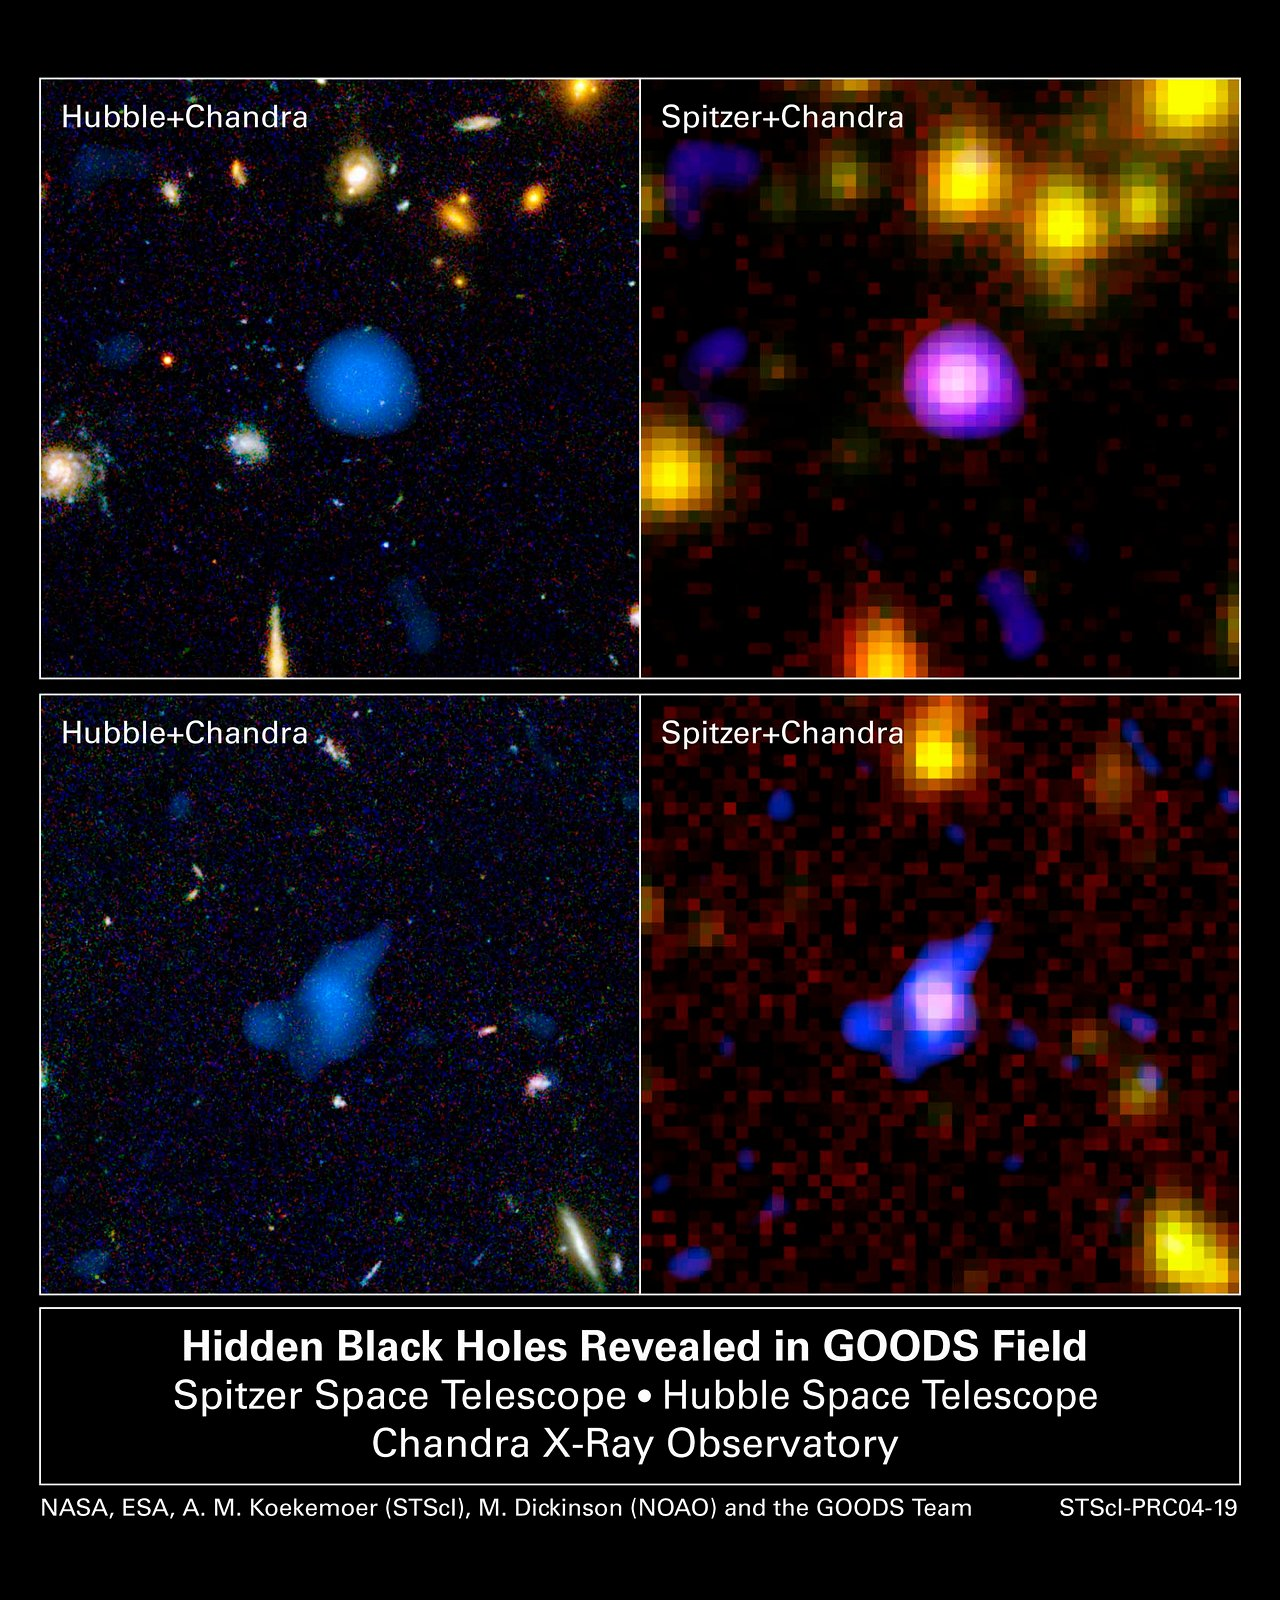 Hidden Black Holes Revealed in GOODS Field